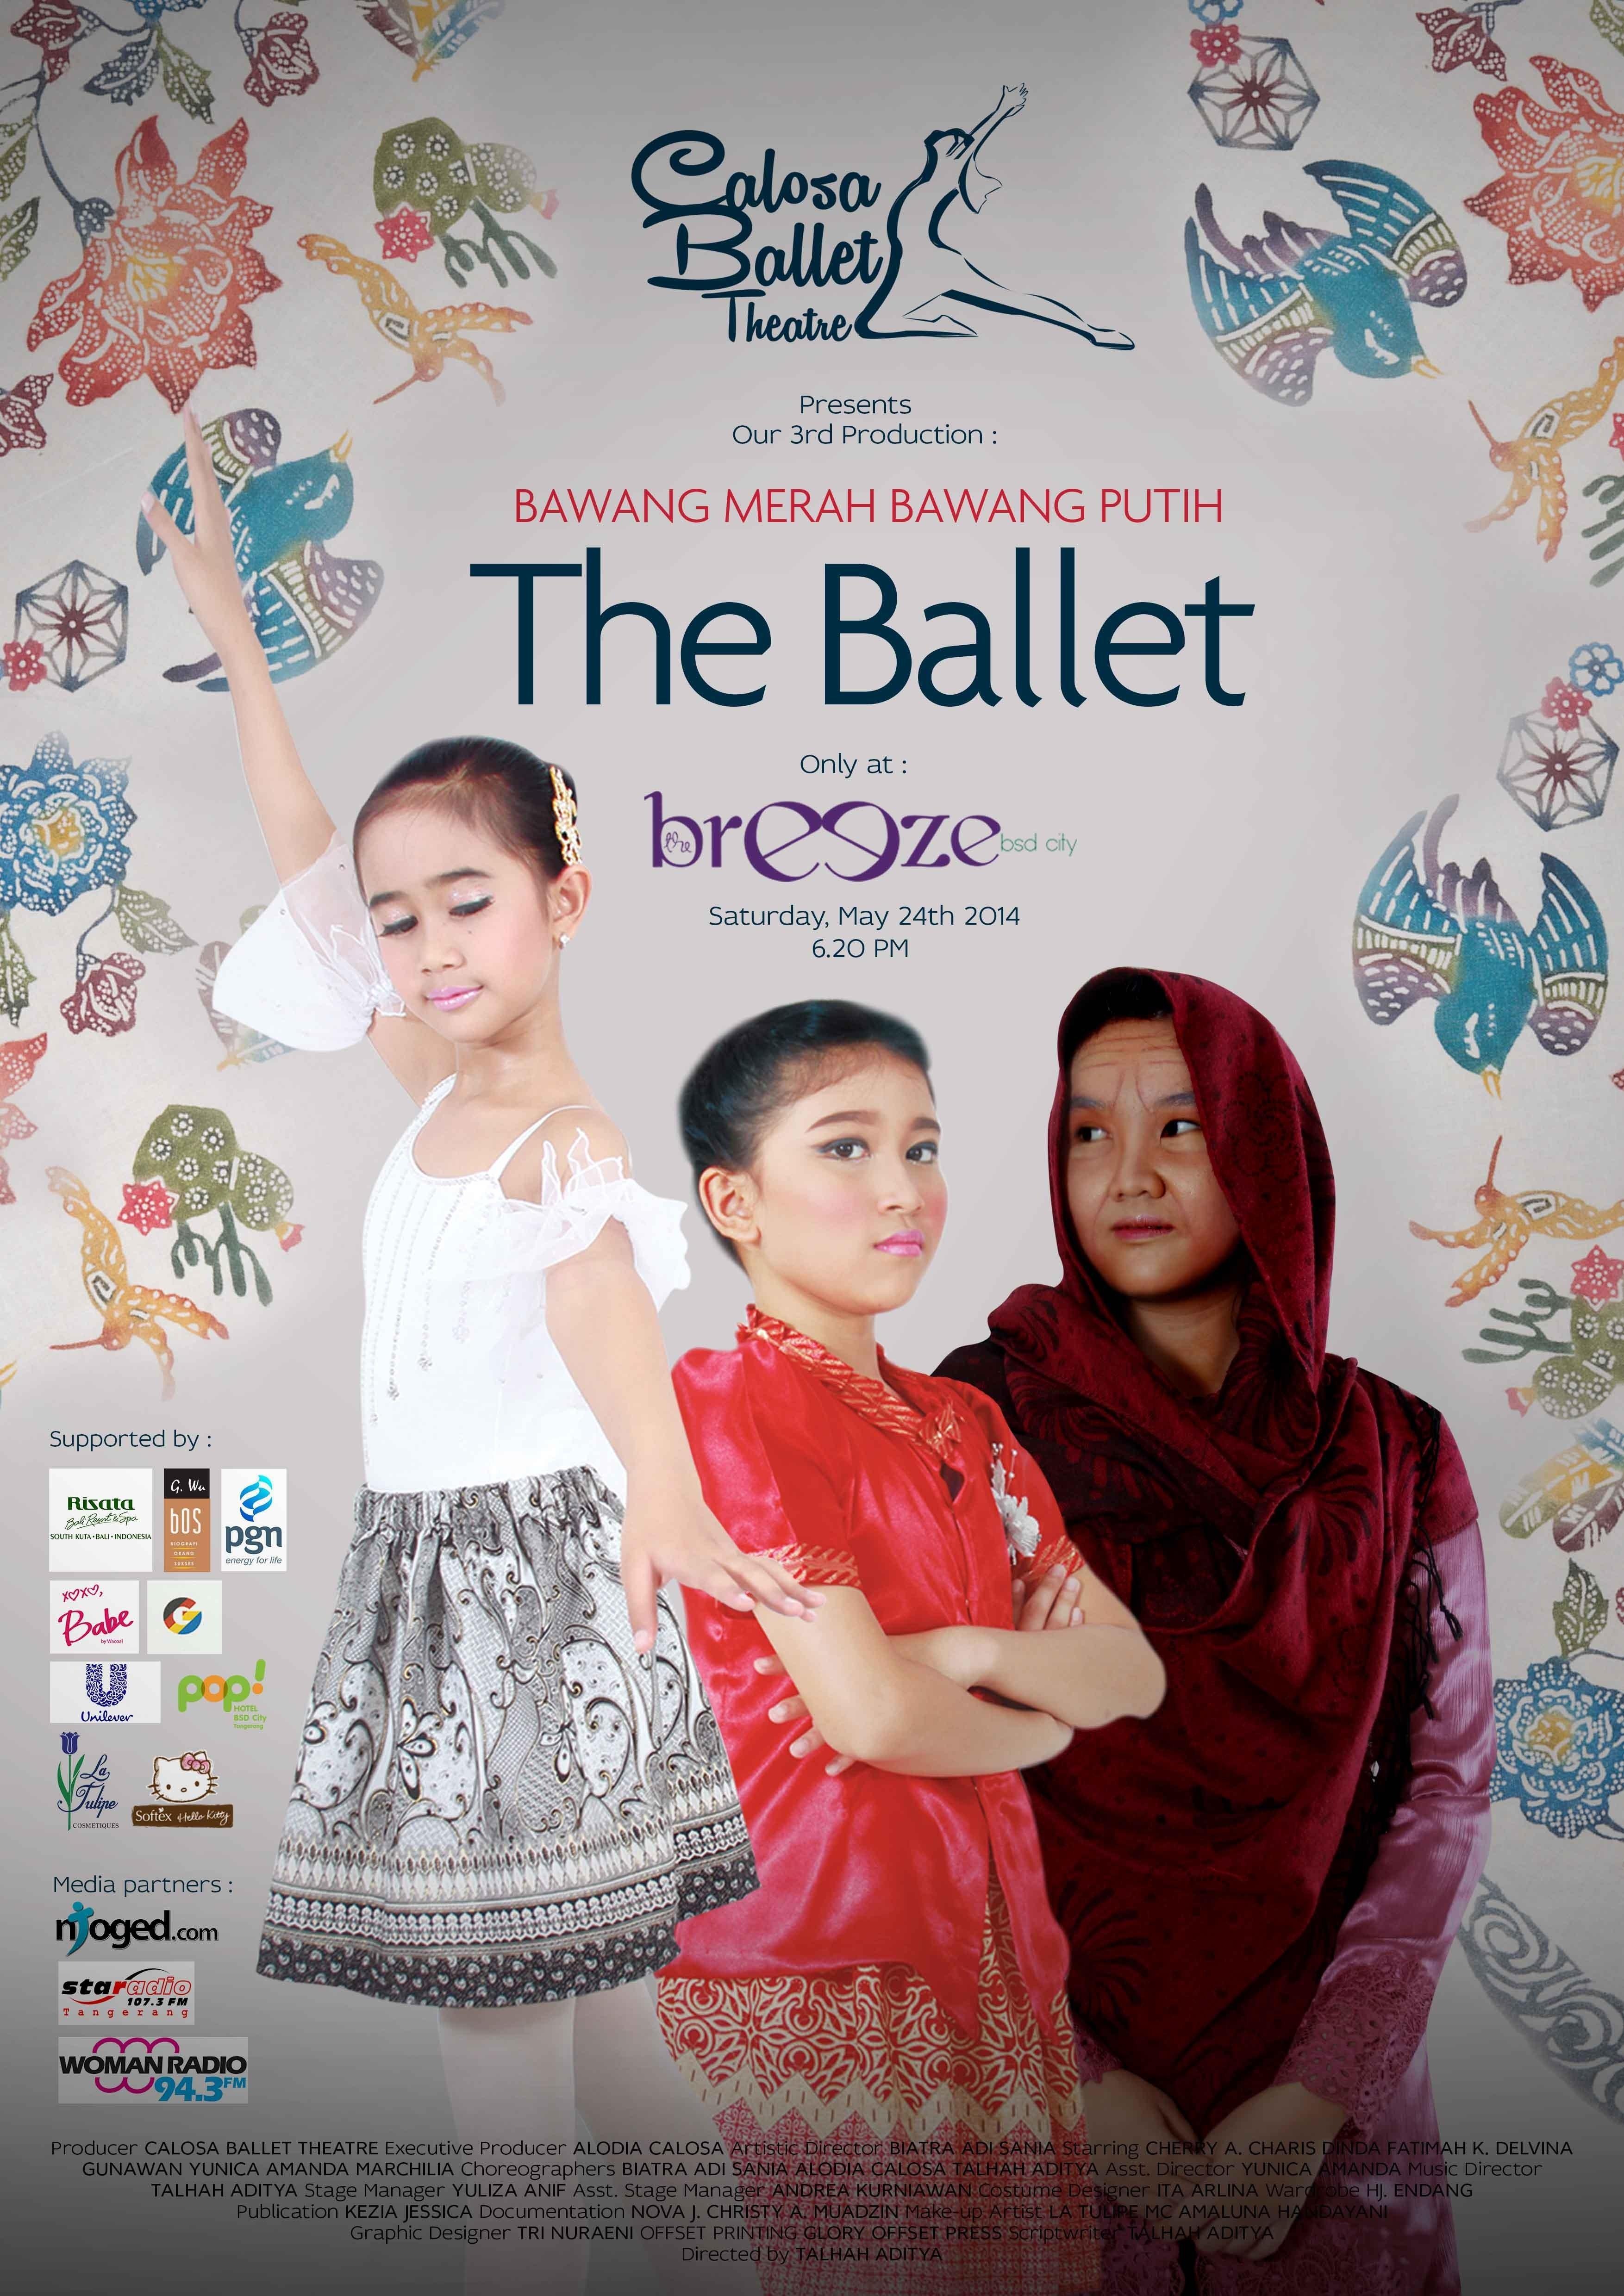 Calosa Ballet Theatre